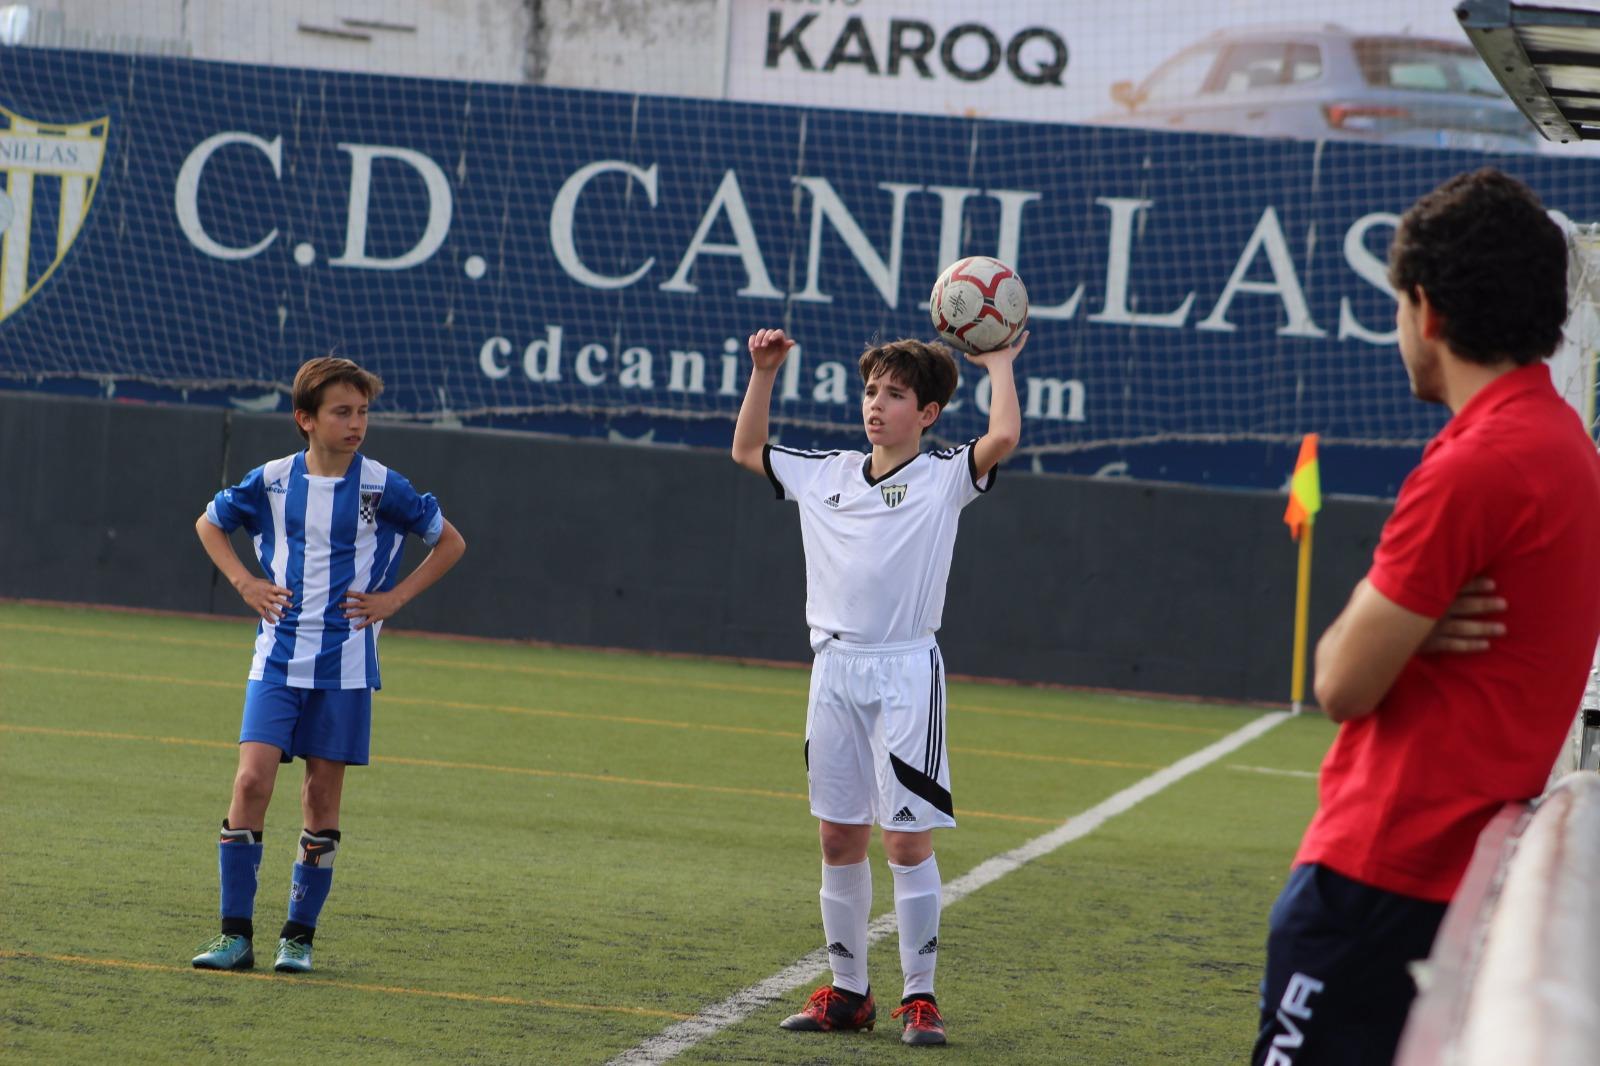 Lucas Domínguez del Infantil B participa en el Torneo Internacional FCBEScola